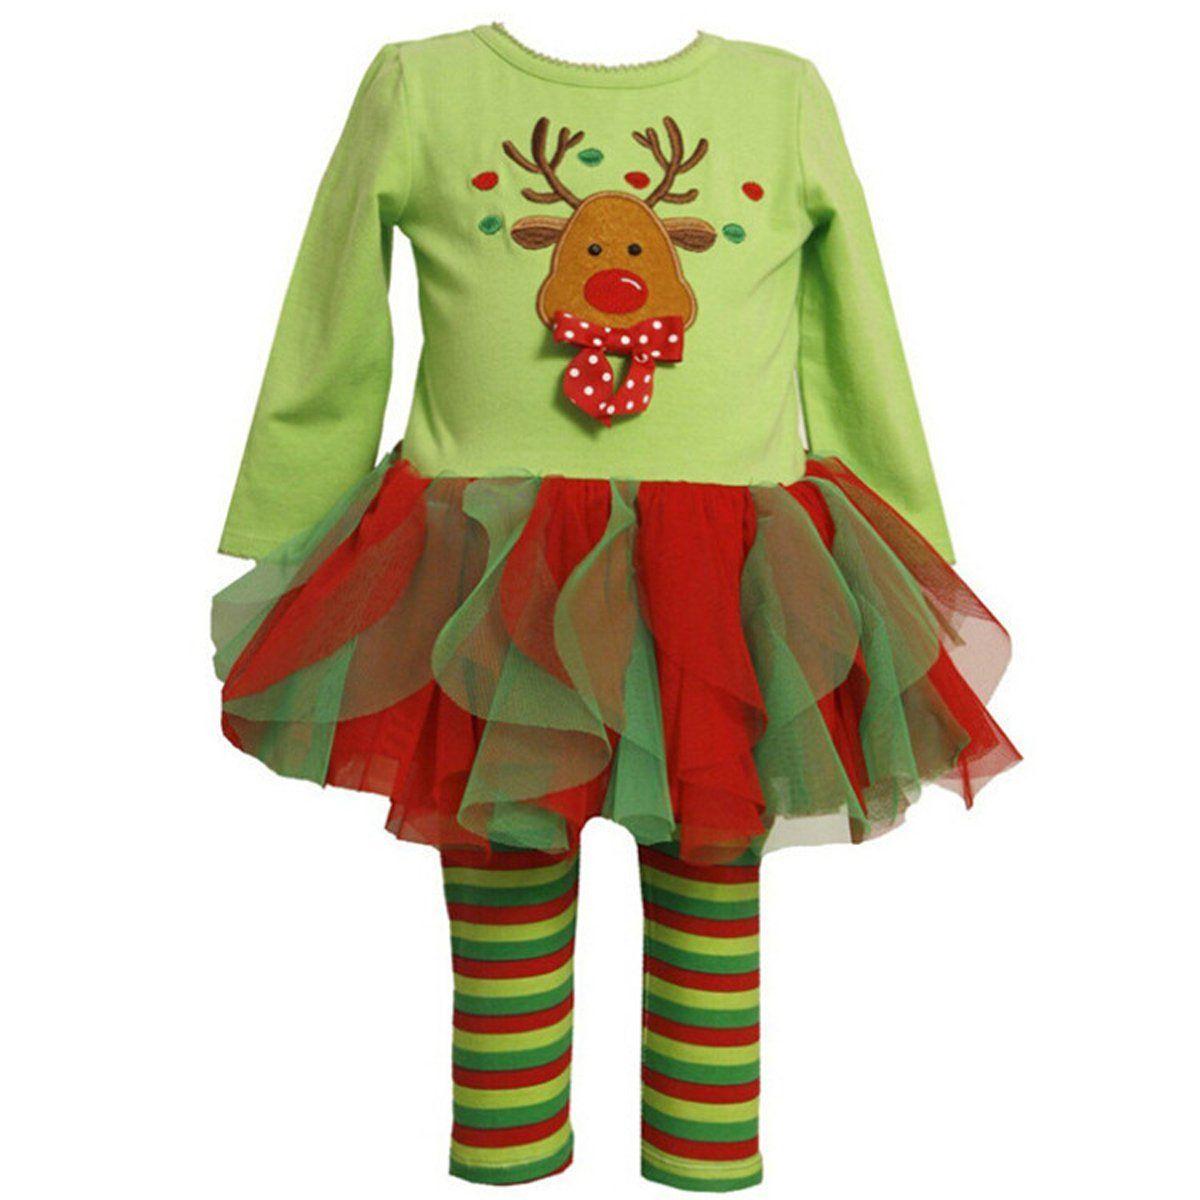 Genluna Child Girls Christmas Elk Outfits Long Sleeve DressPants